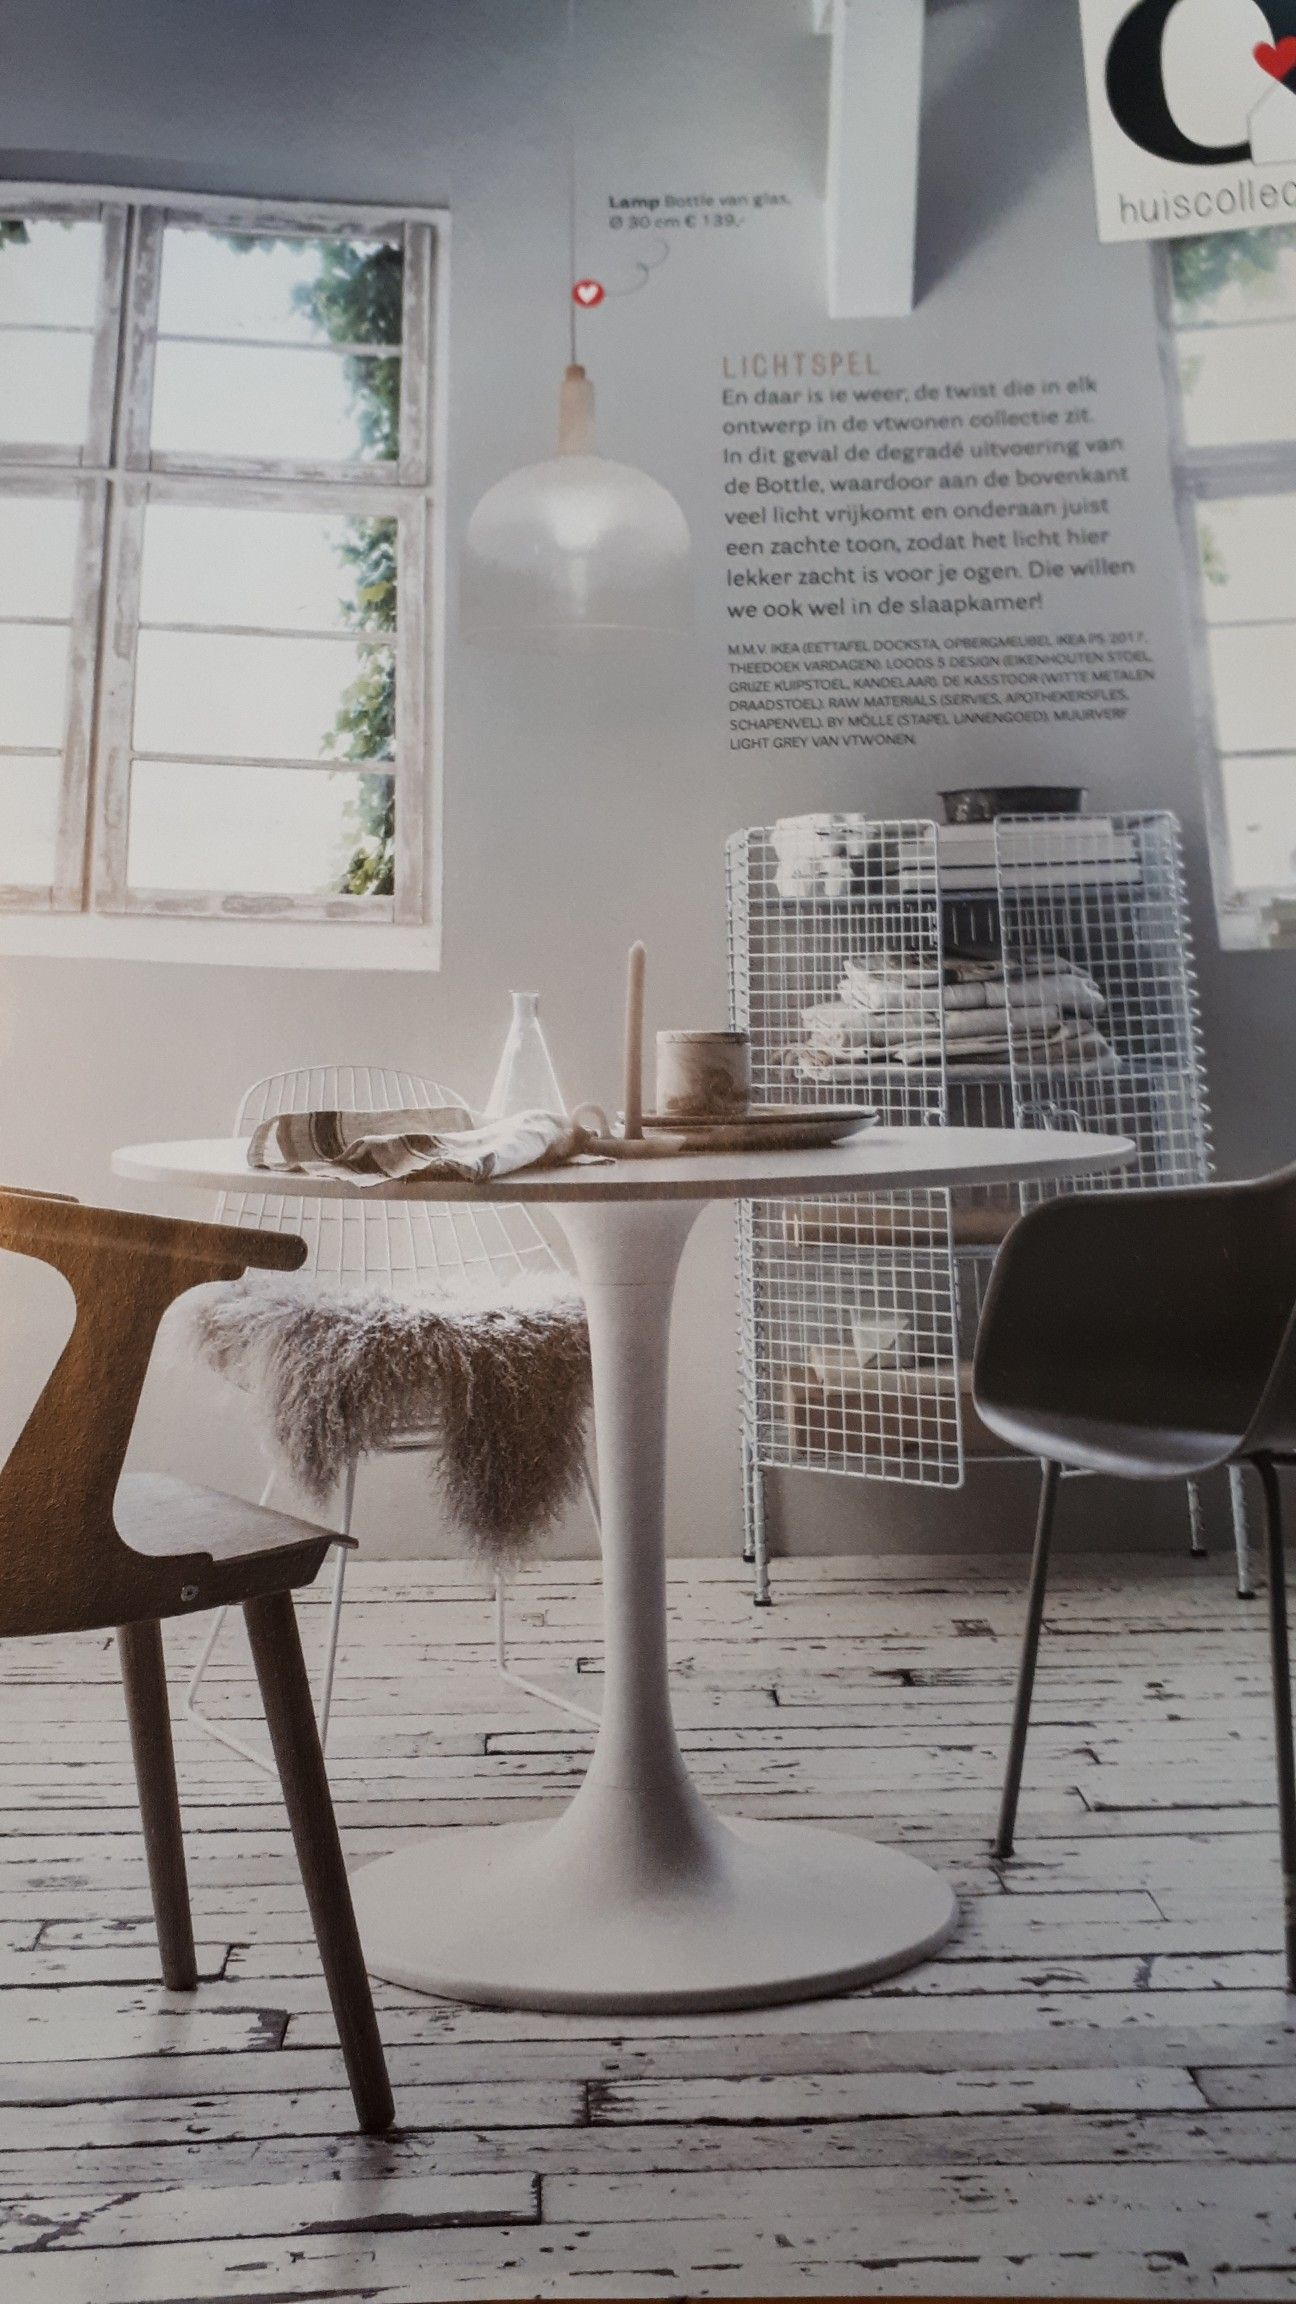 Ikea Witte Ronde Tafel.Ronde Witte Tafel Ikea Kantoor Home Office Tafel Ikea